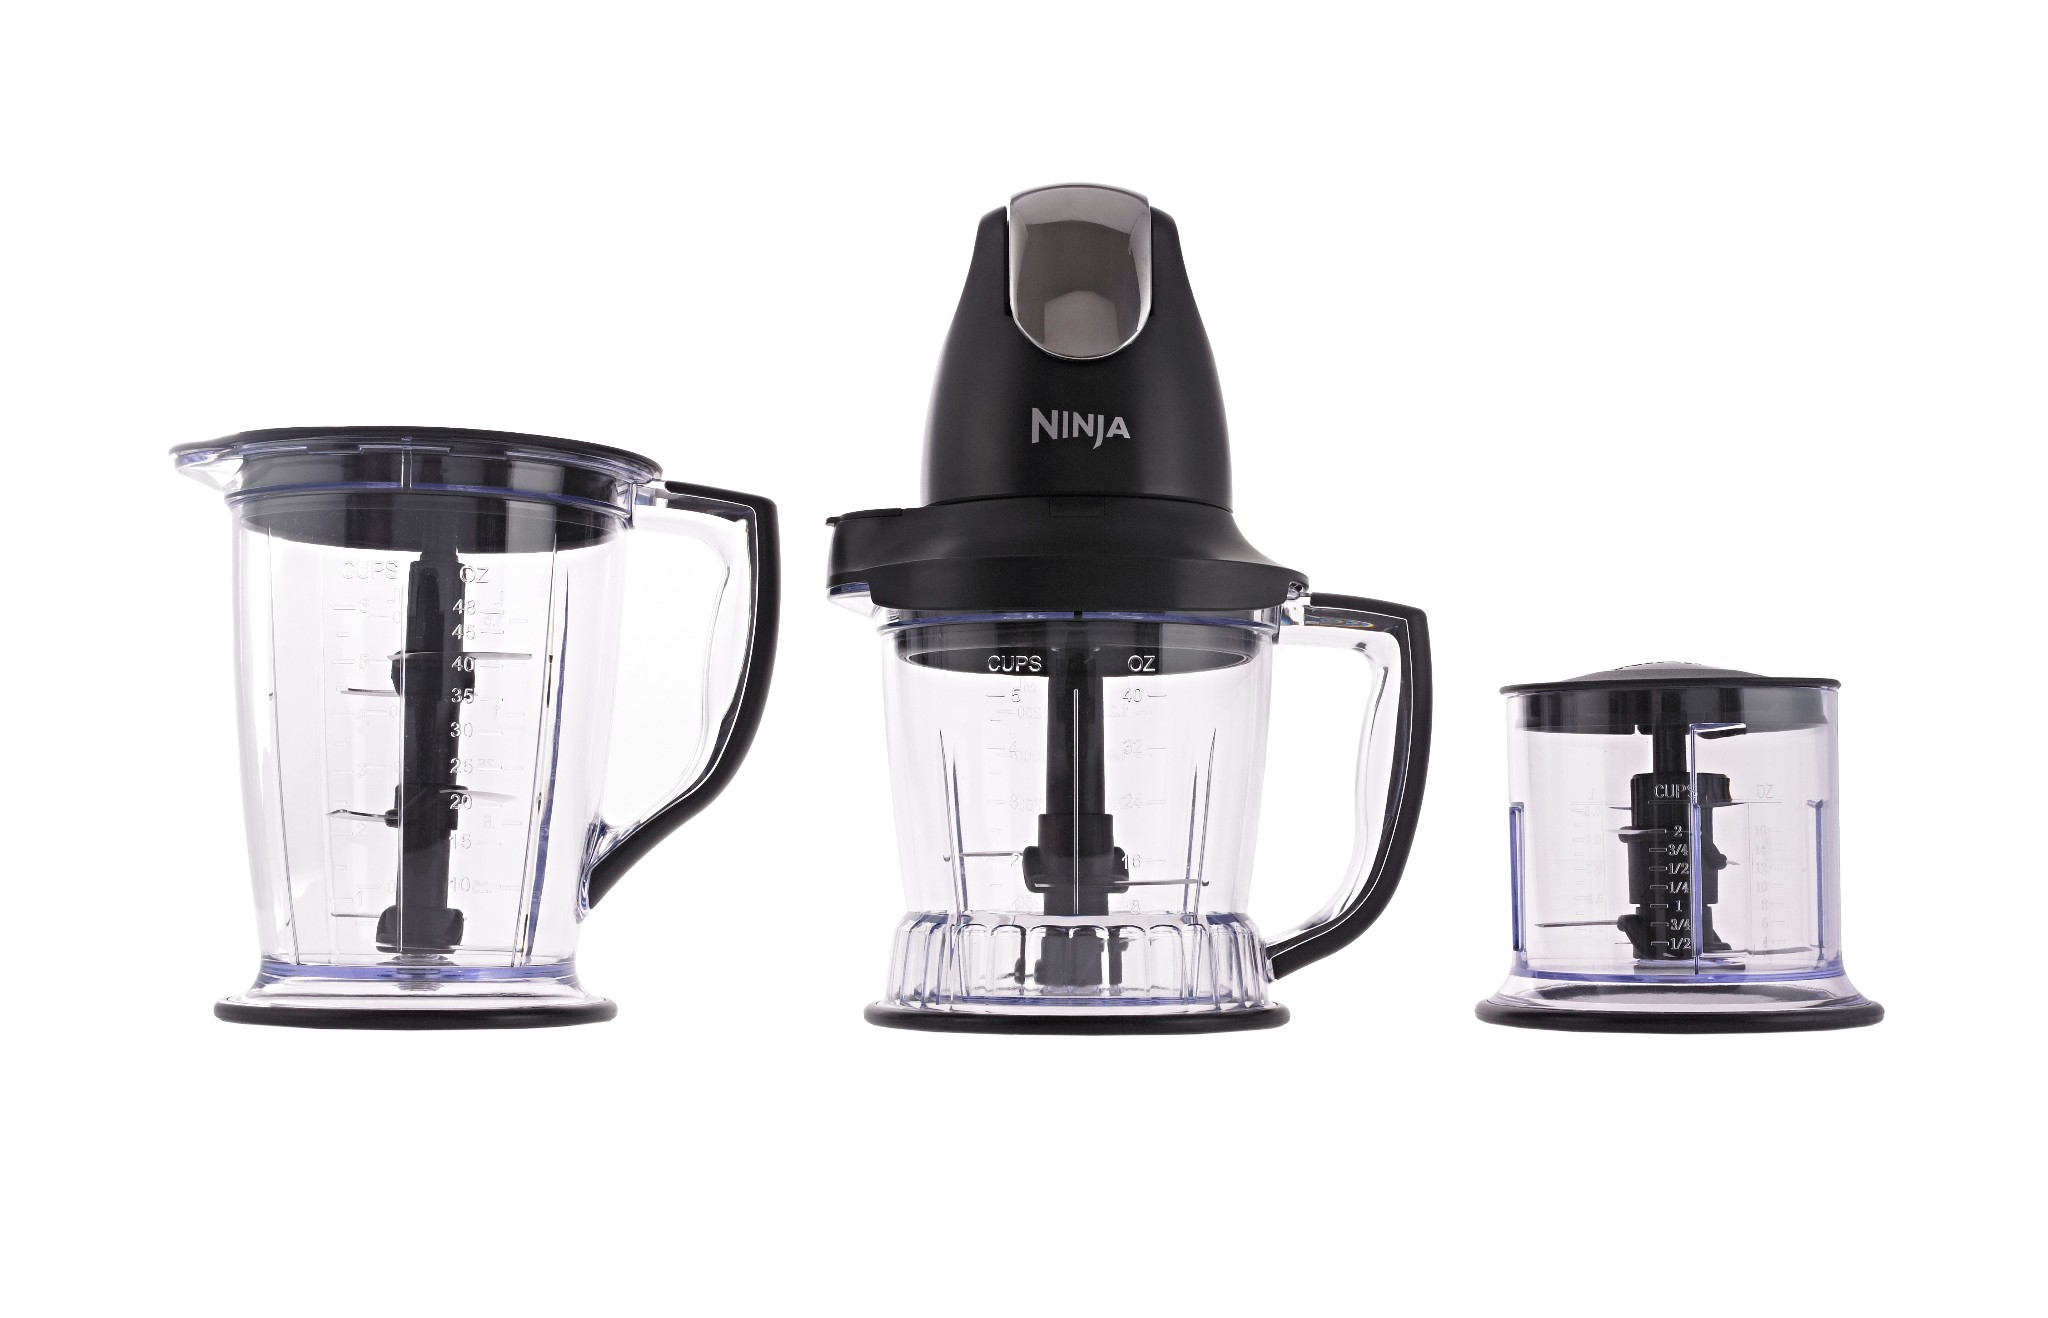 ninja kitchen system pulse table stools master prep professional food chopper 500w